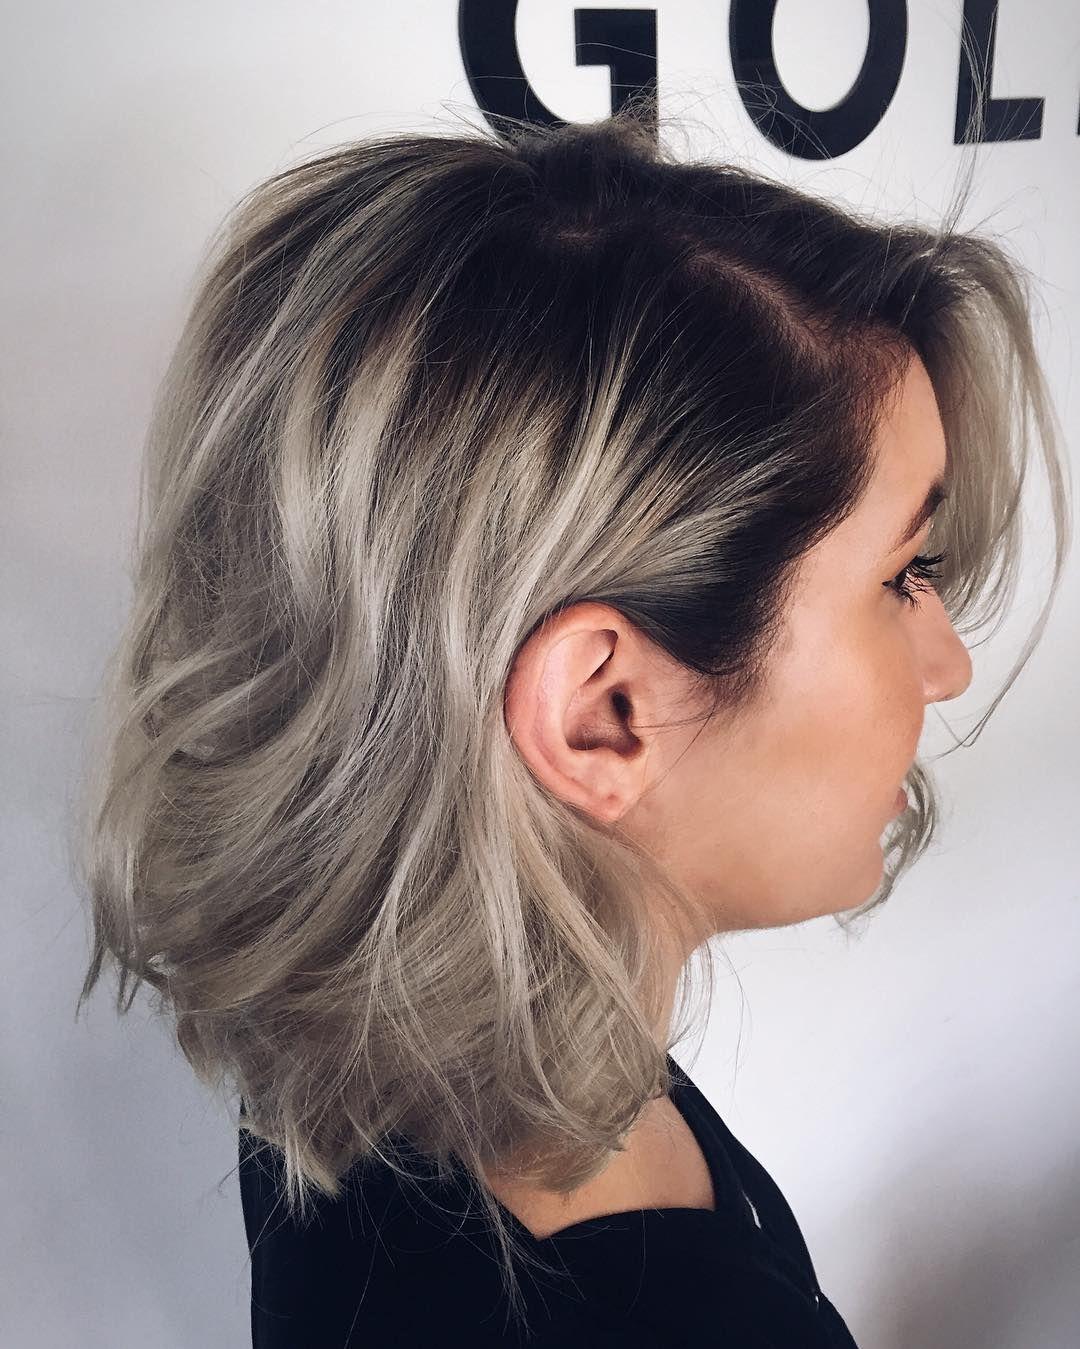 Natural Silver Curls Curly Silver Hair Natural Grey Curls Curly Grey Hair Silverhairlookthatilike Grey Curly Hair Curly Silver Hair Gray Hair Highlights